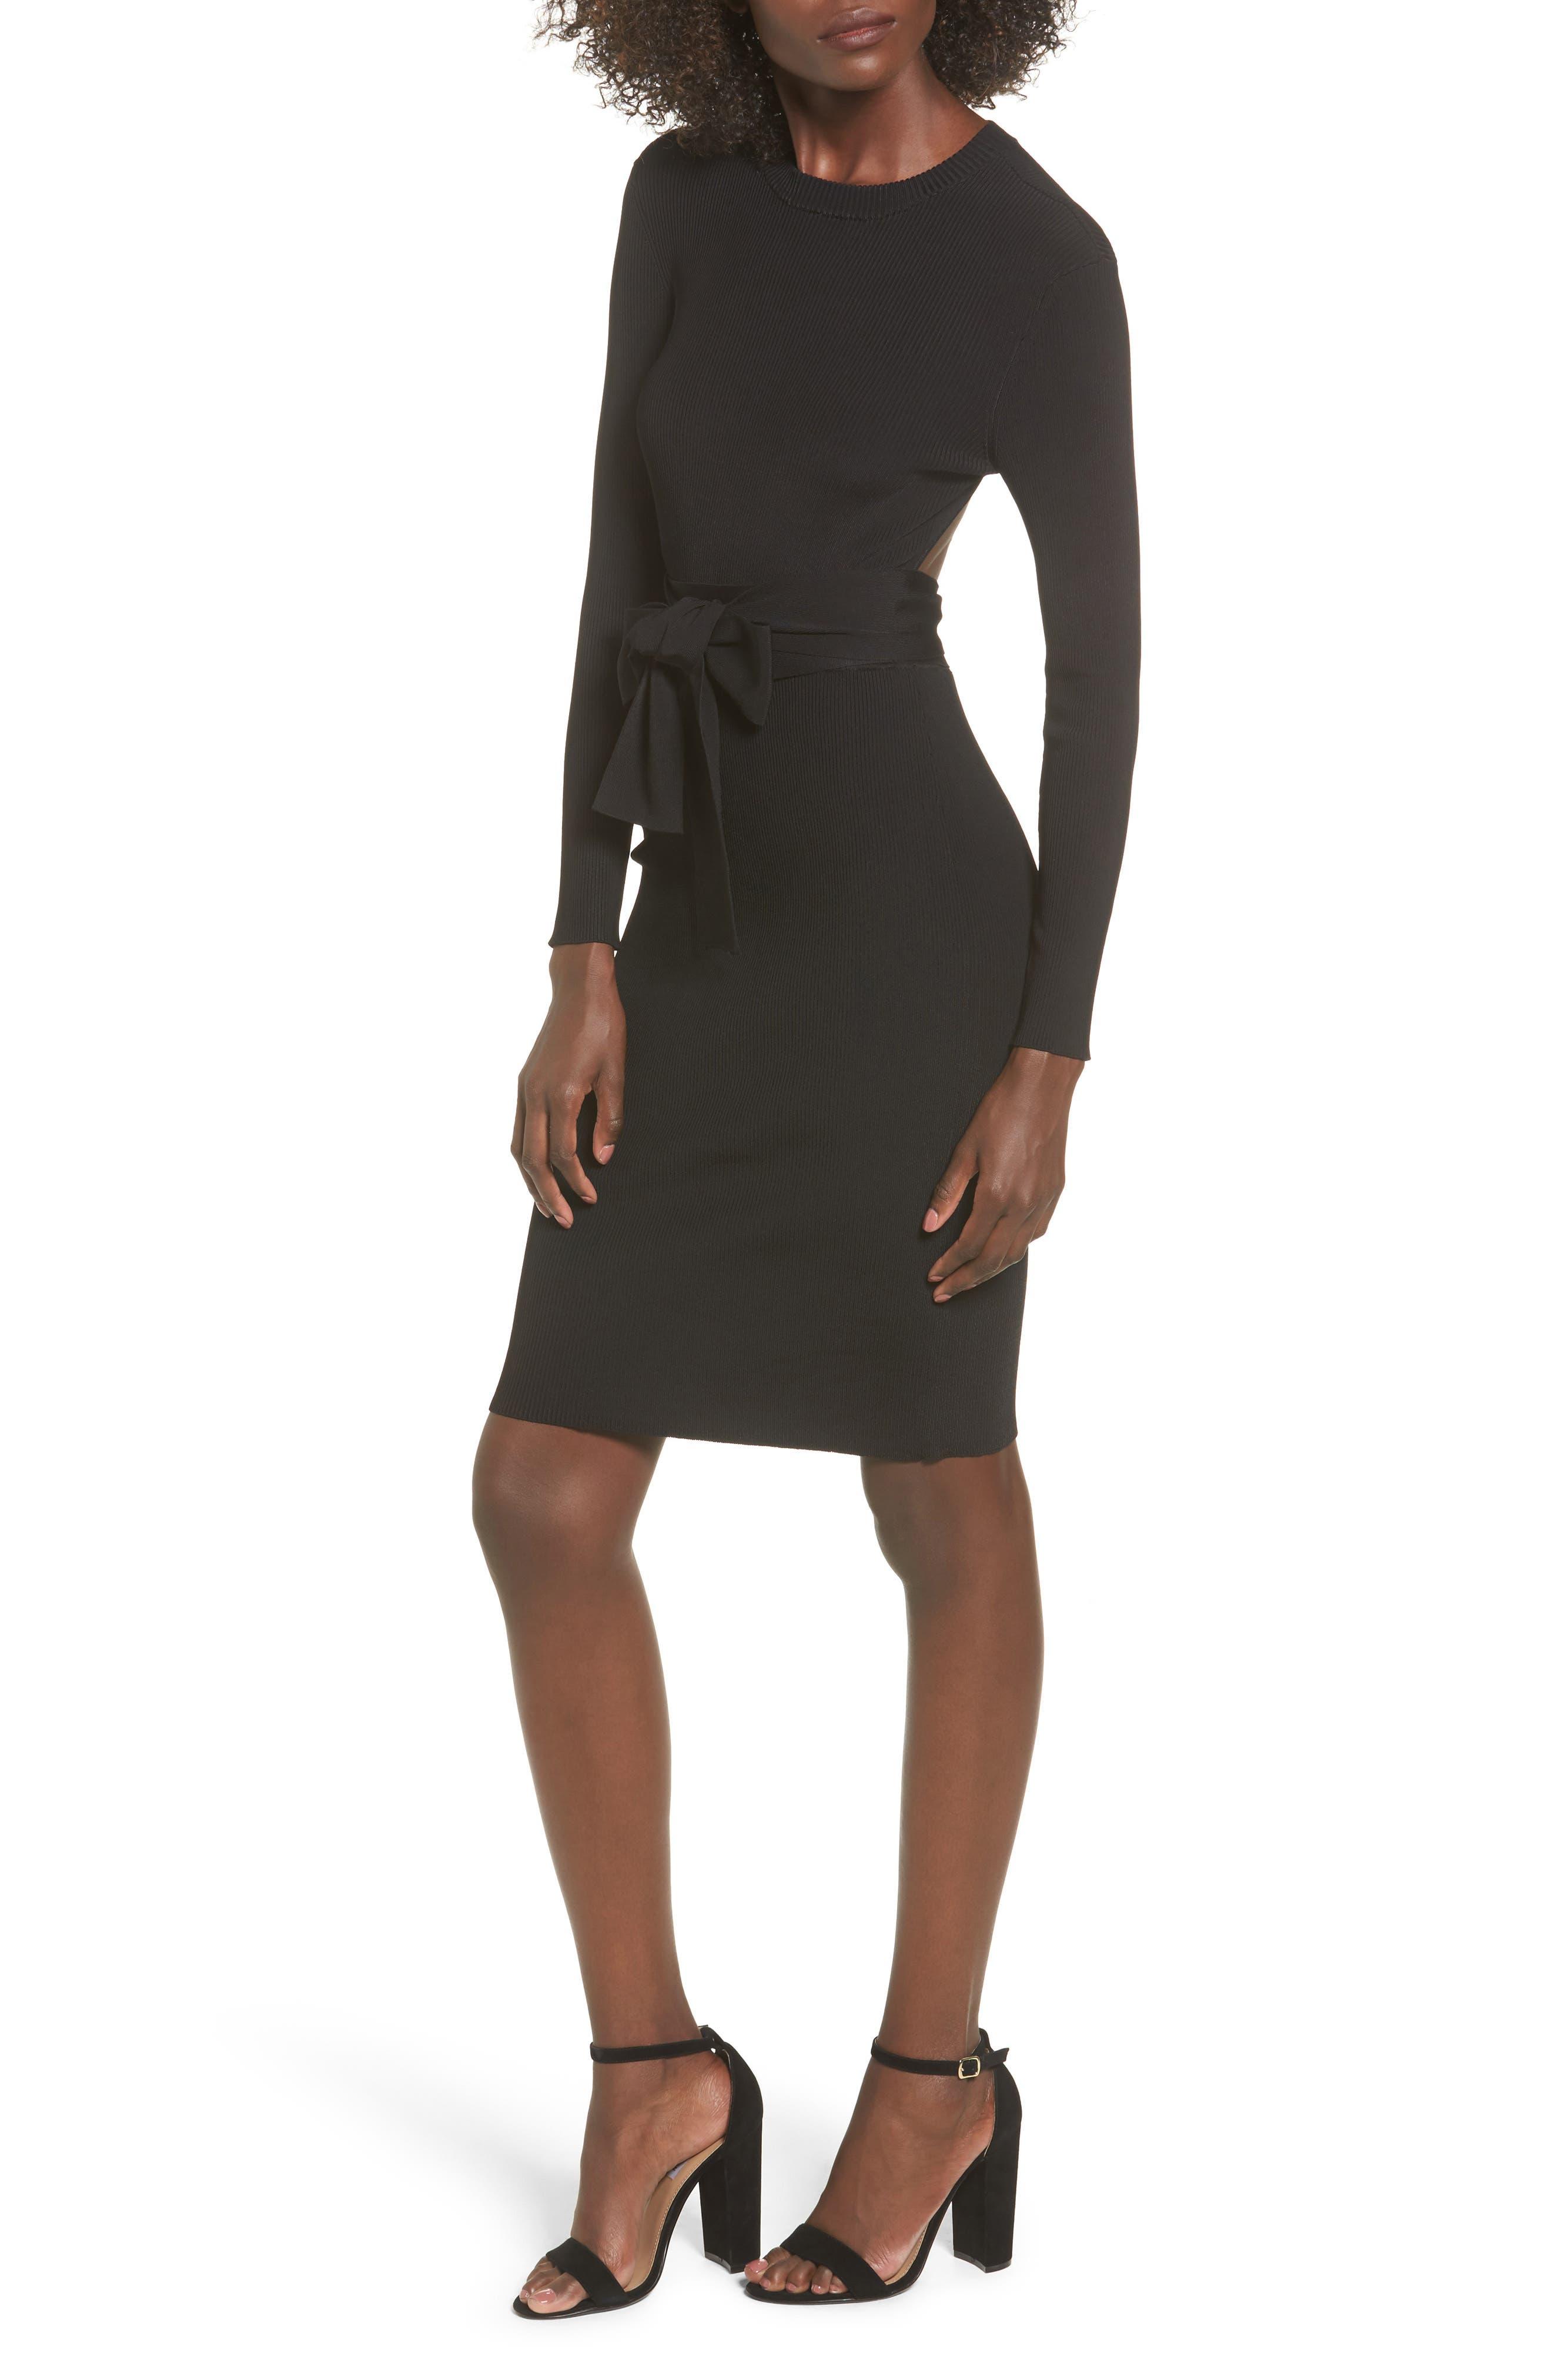 Alternate Image 1 Selected - NBD Desiree Cutout Ribbed Body-Con Dress